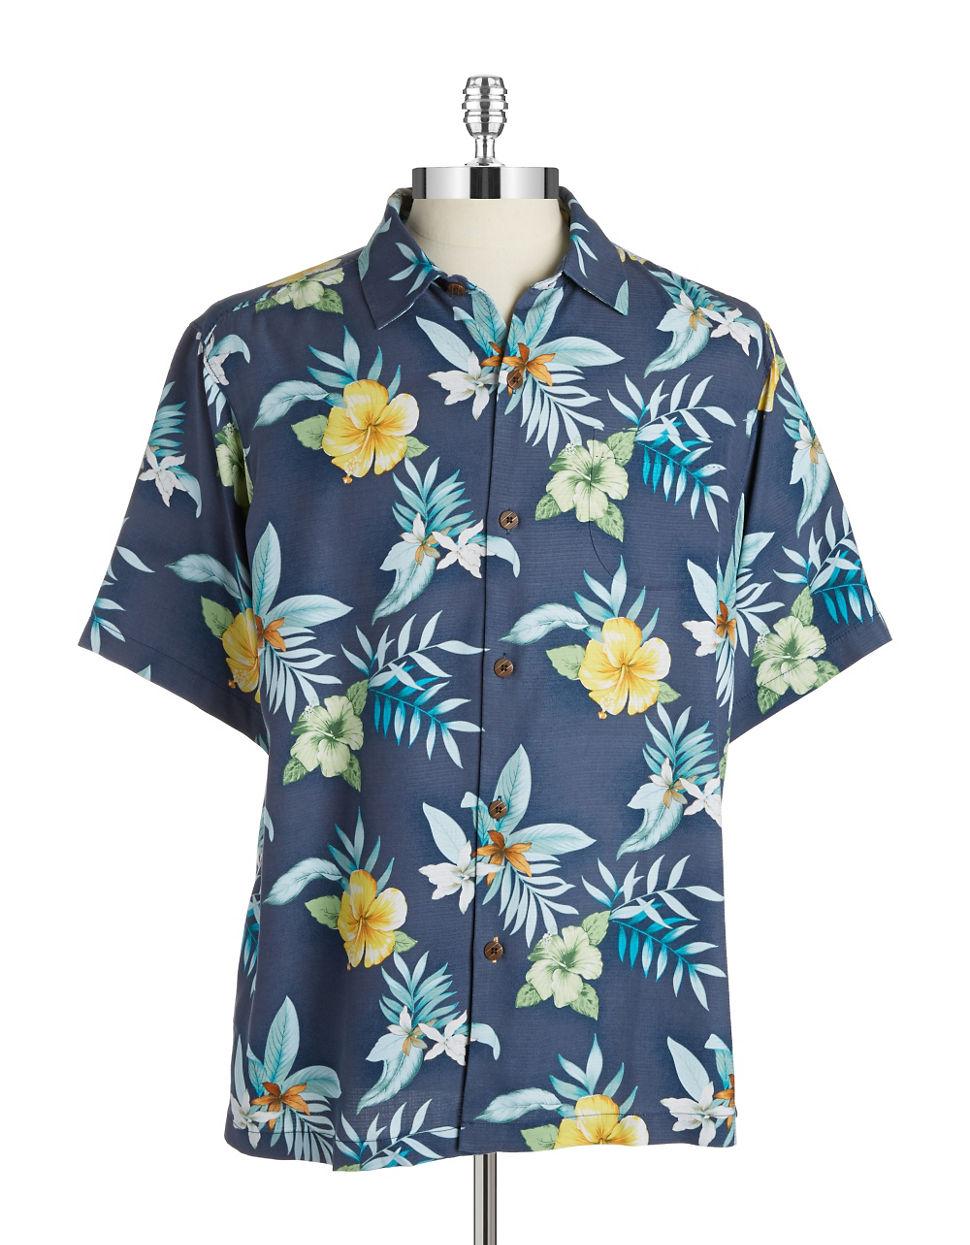 Lyst Tommy Bahama Silk Hawaiian Shirt In Blue For Men